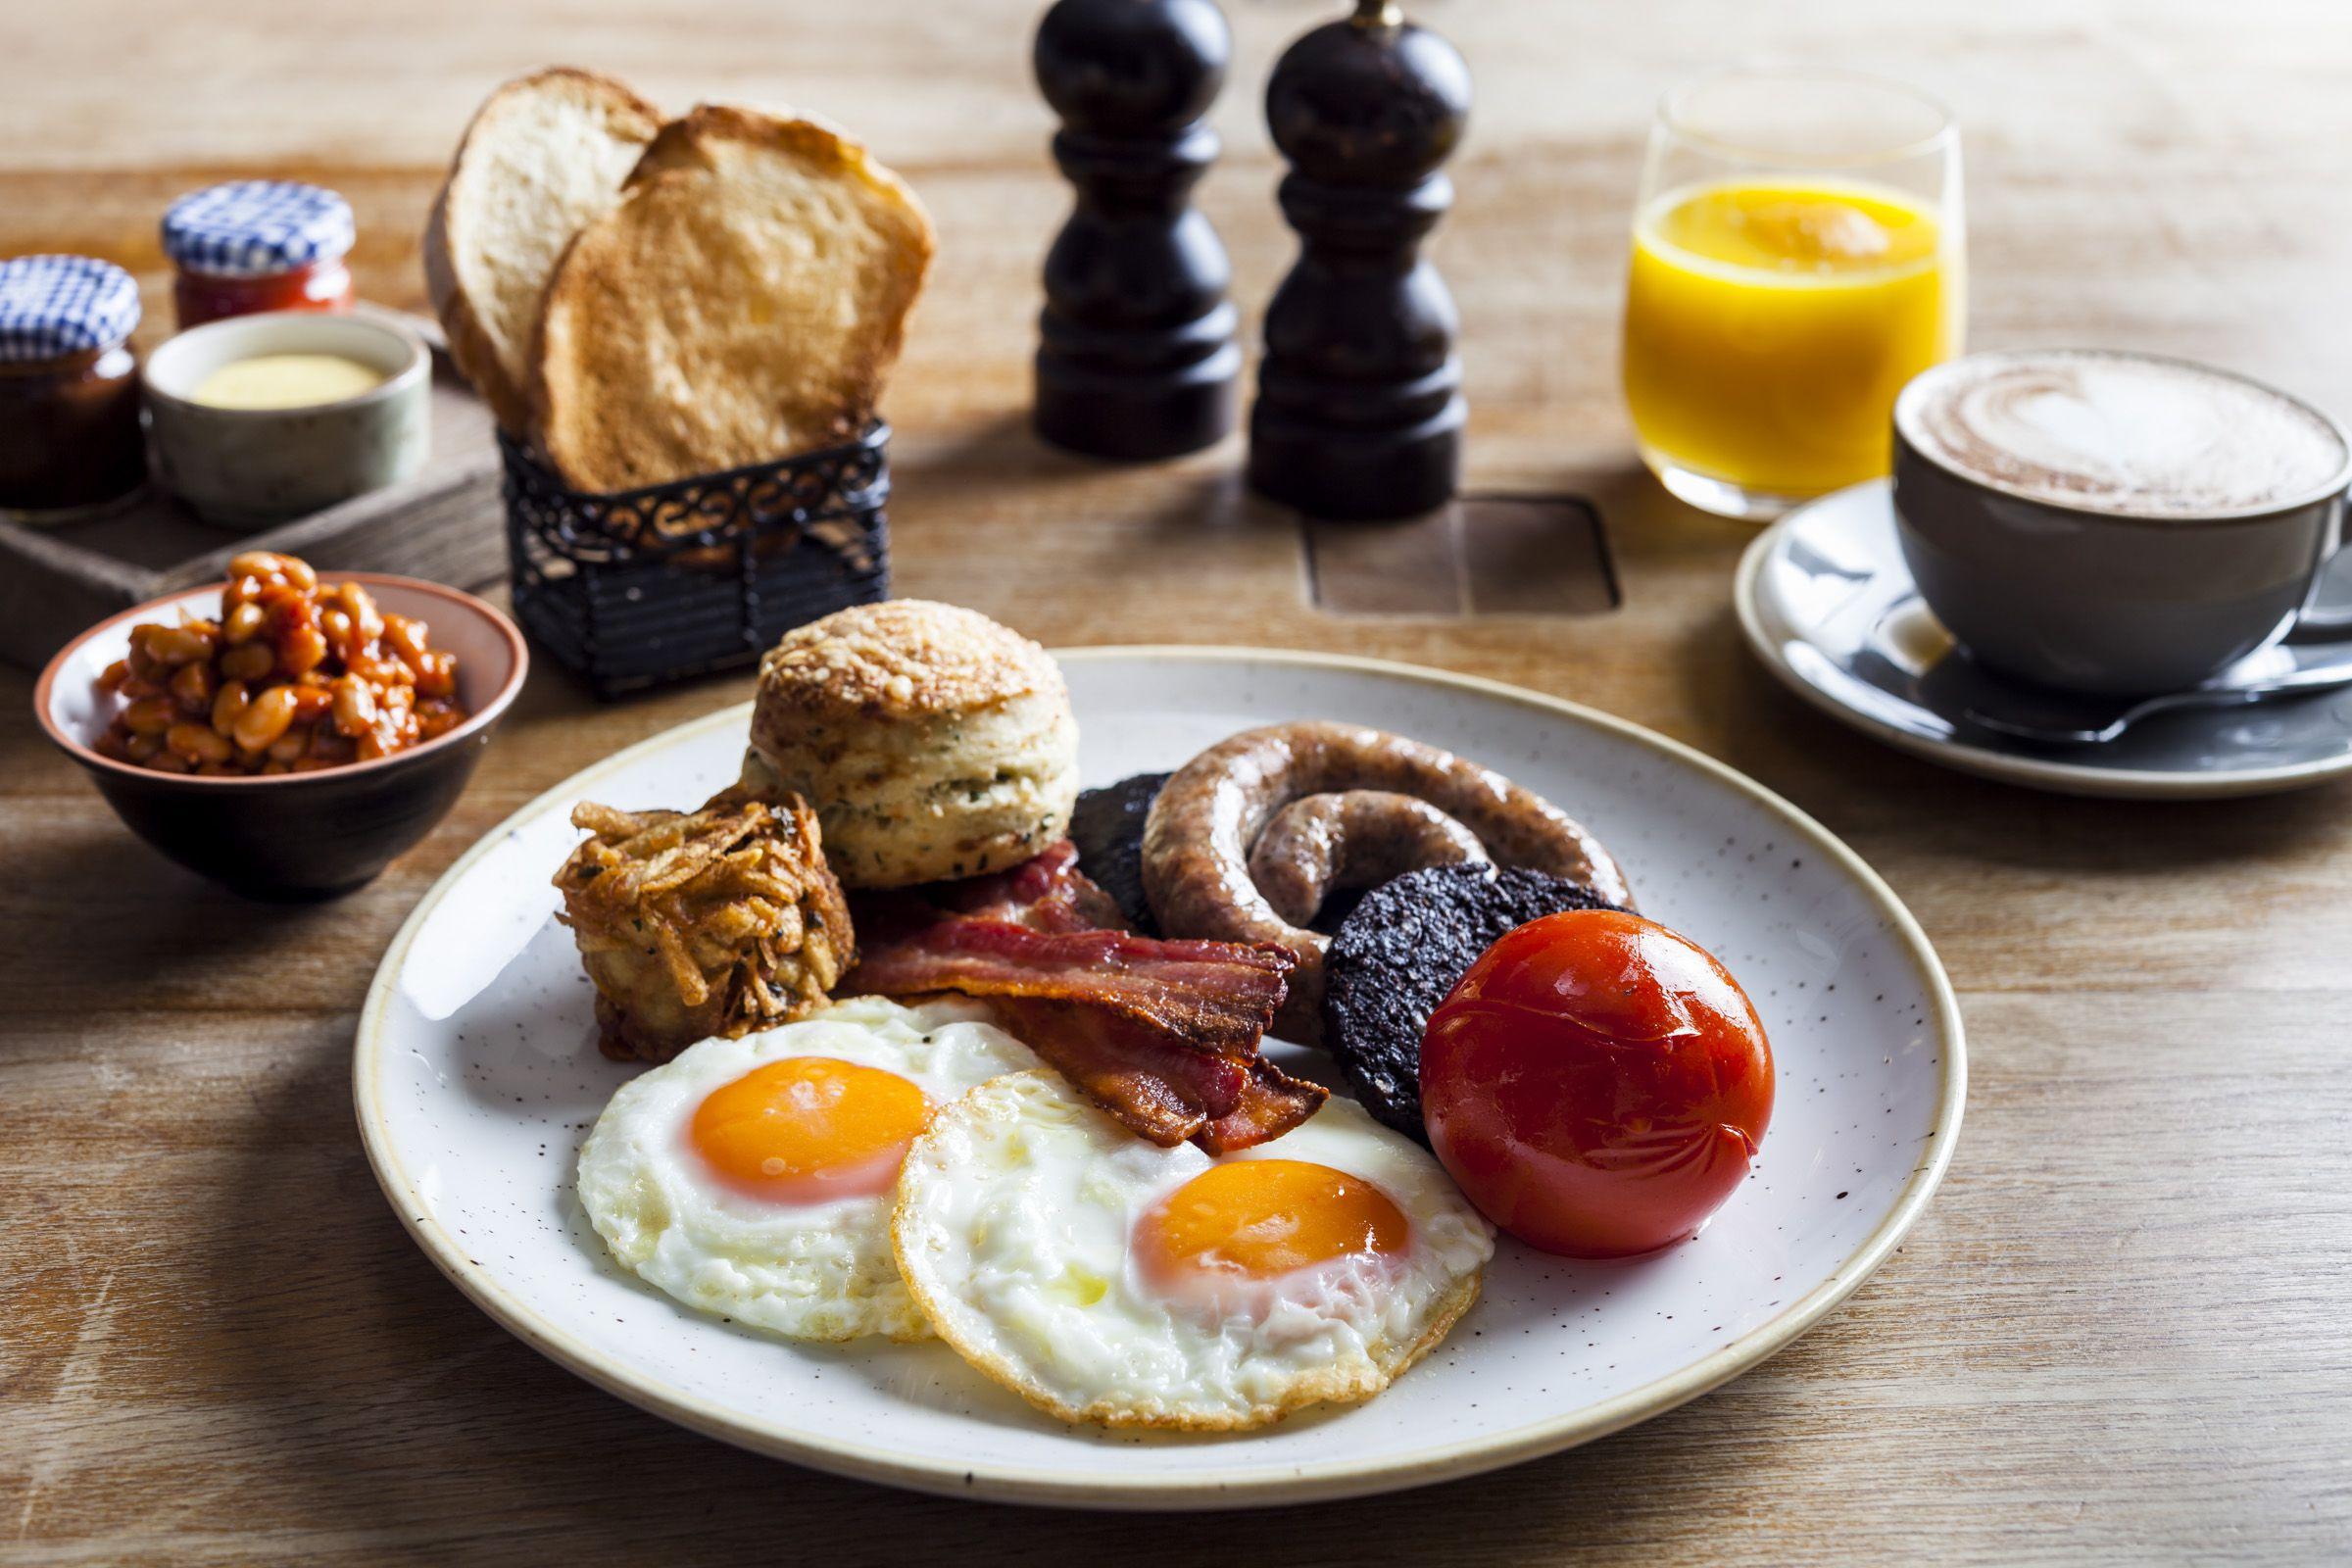 duck waffle foods drinks english british favorite breakfast britain london